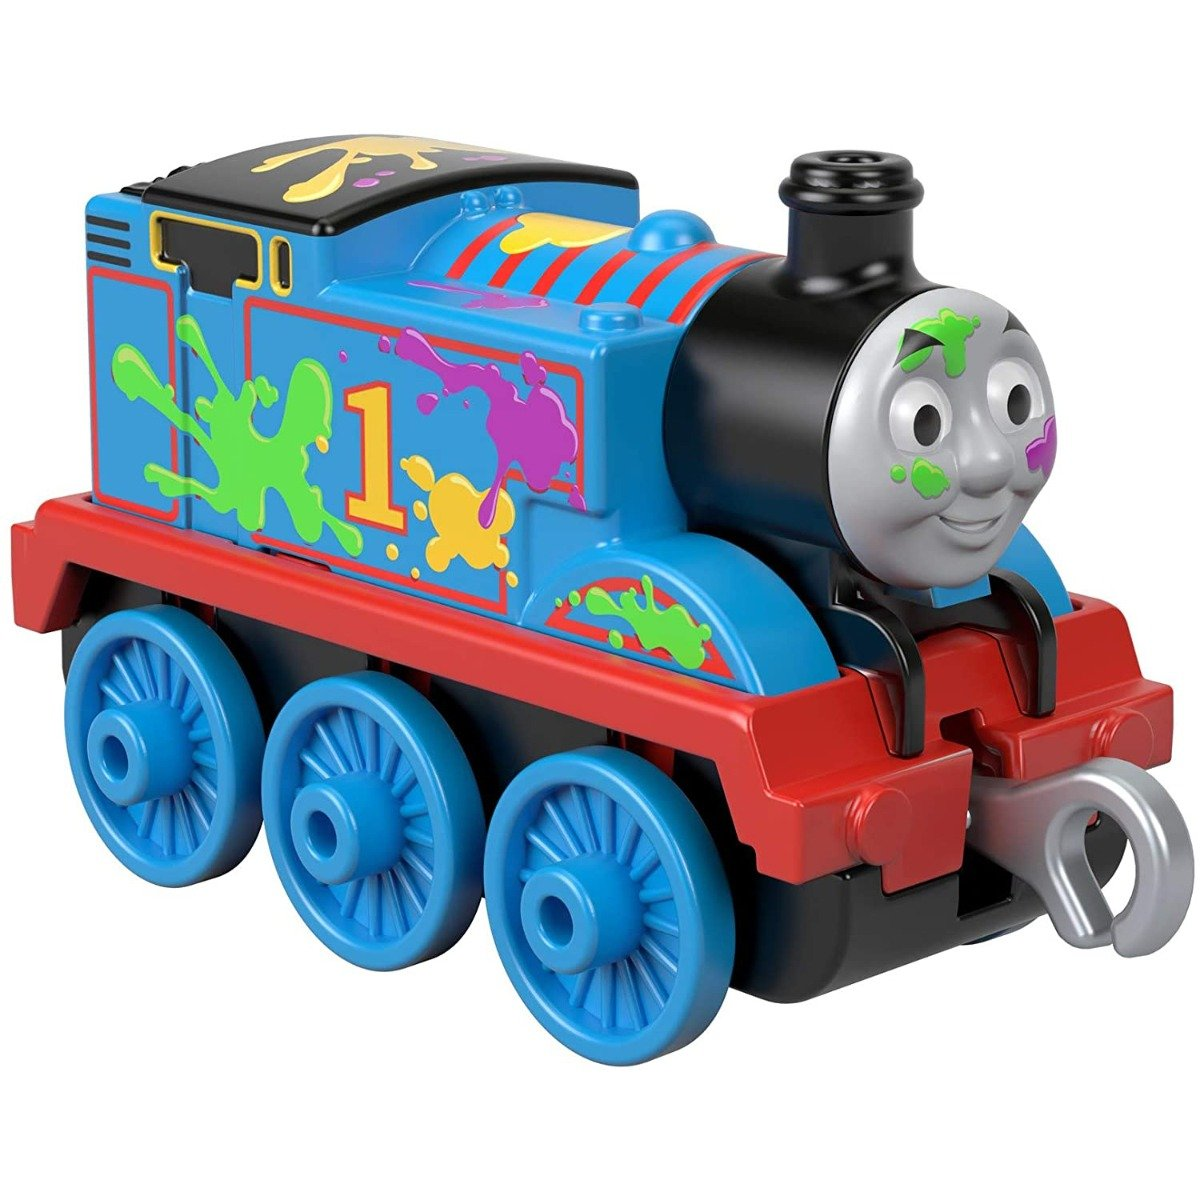 Trenulet metalic Thomas and Friends, Thomas GHK64